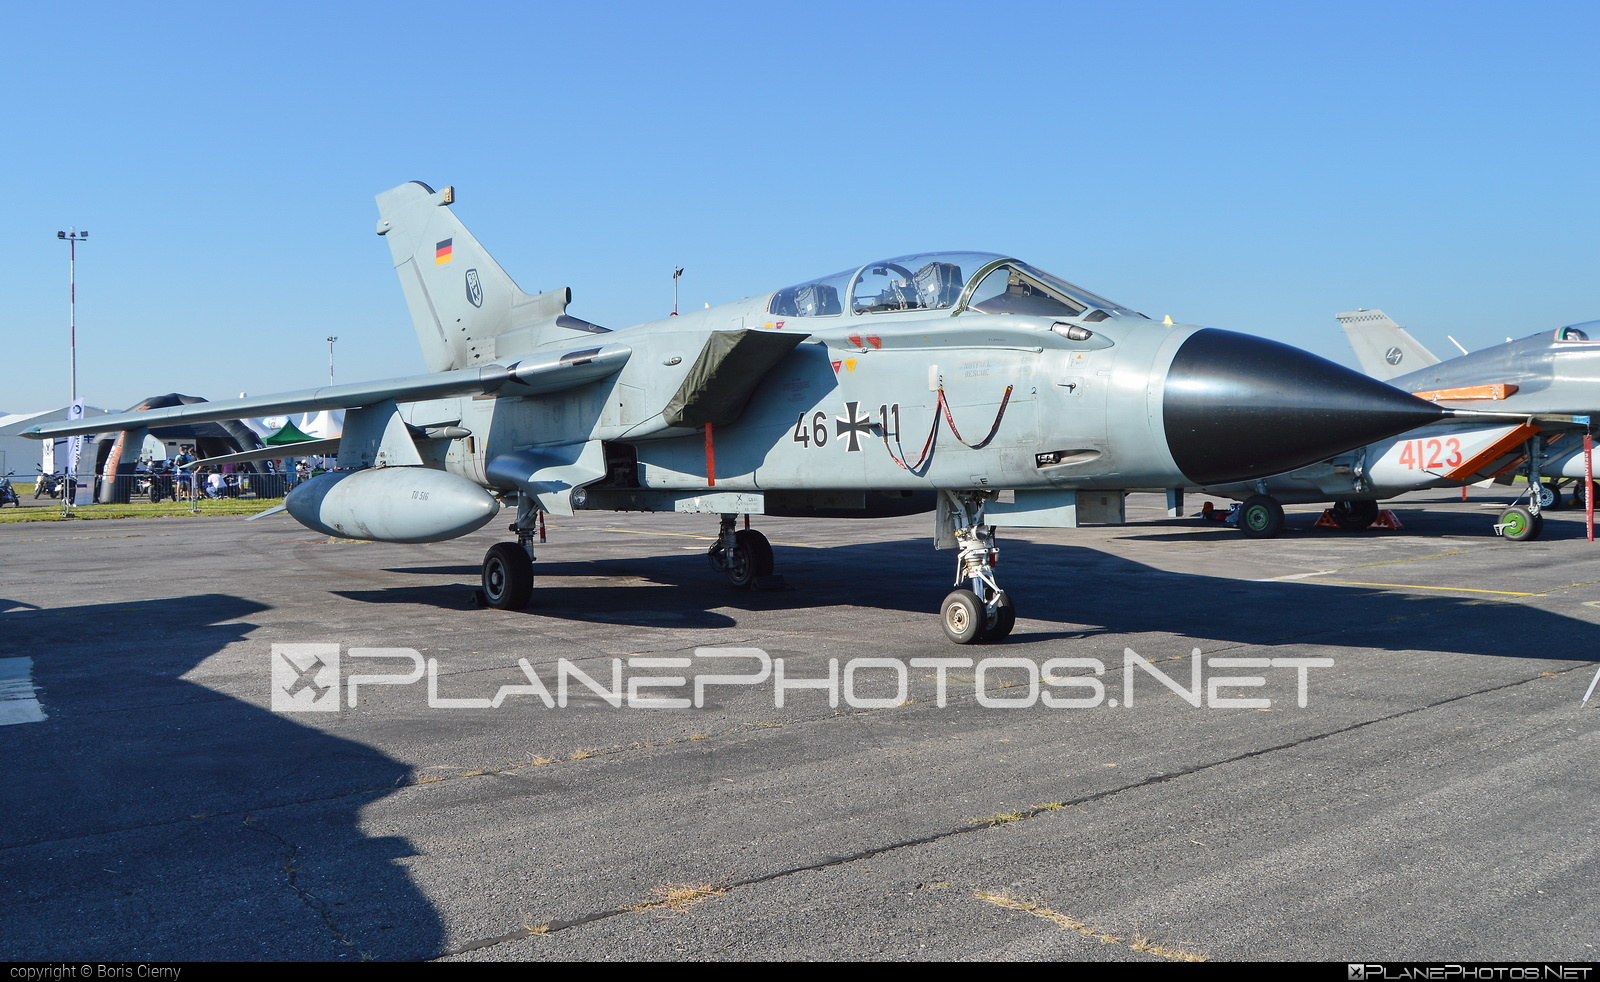 Panavia Tornado IDS - 46+11 operated by Luftwaffe (German Air Force) #GermanAirForce #luftwaffe #panavia #panaviatornado #tornadoids